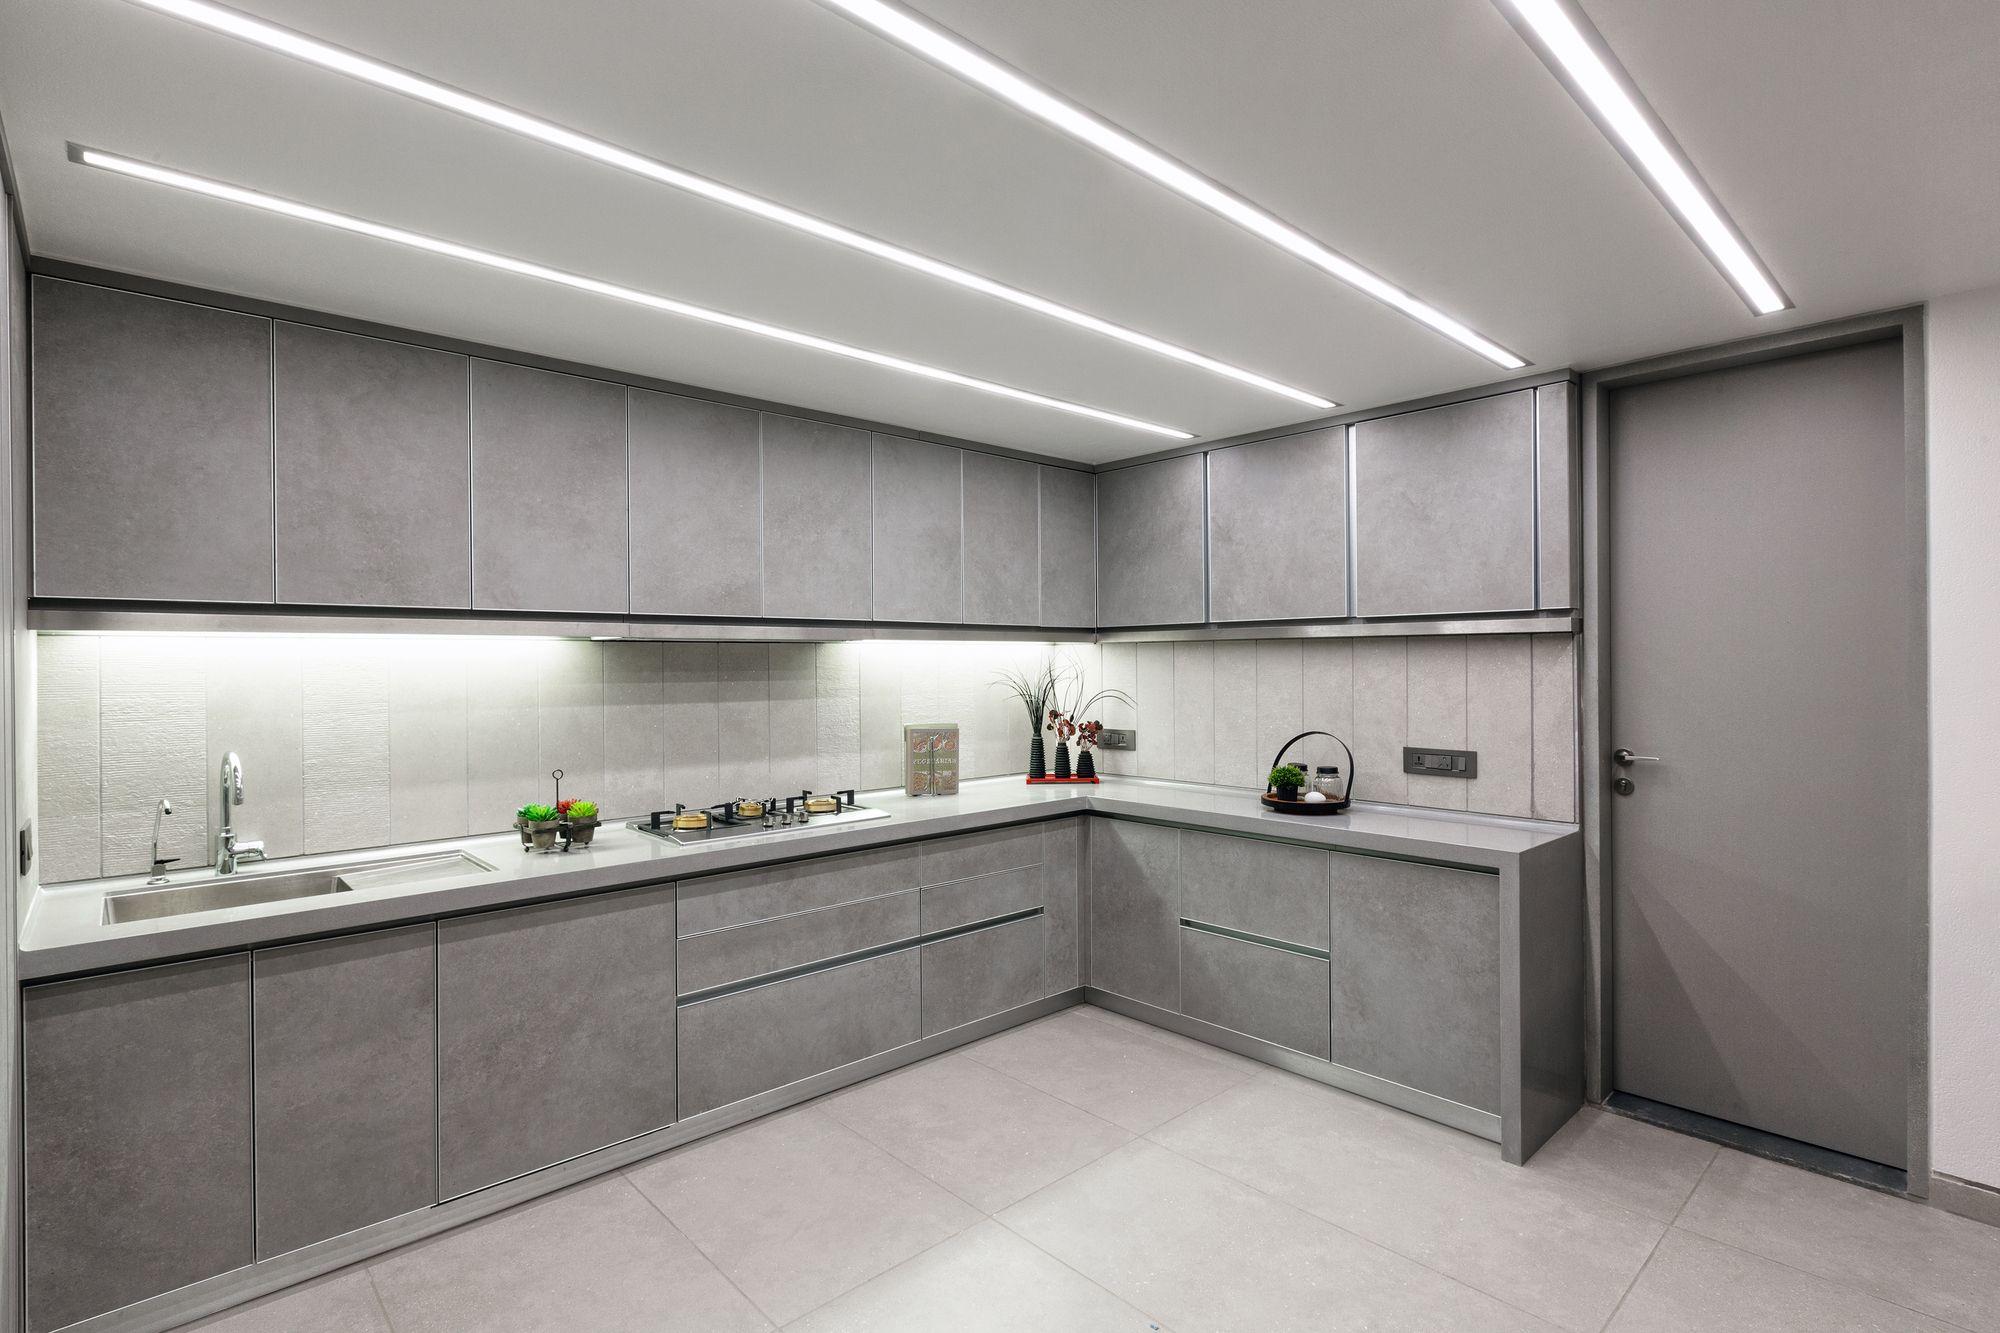 54fe62cee58ece91ea000095_1102-penthouse-apical-reform_kitchen_01.jpg (2000×1333)